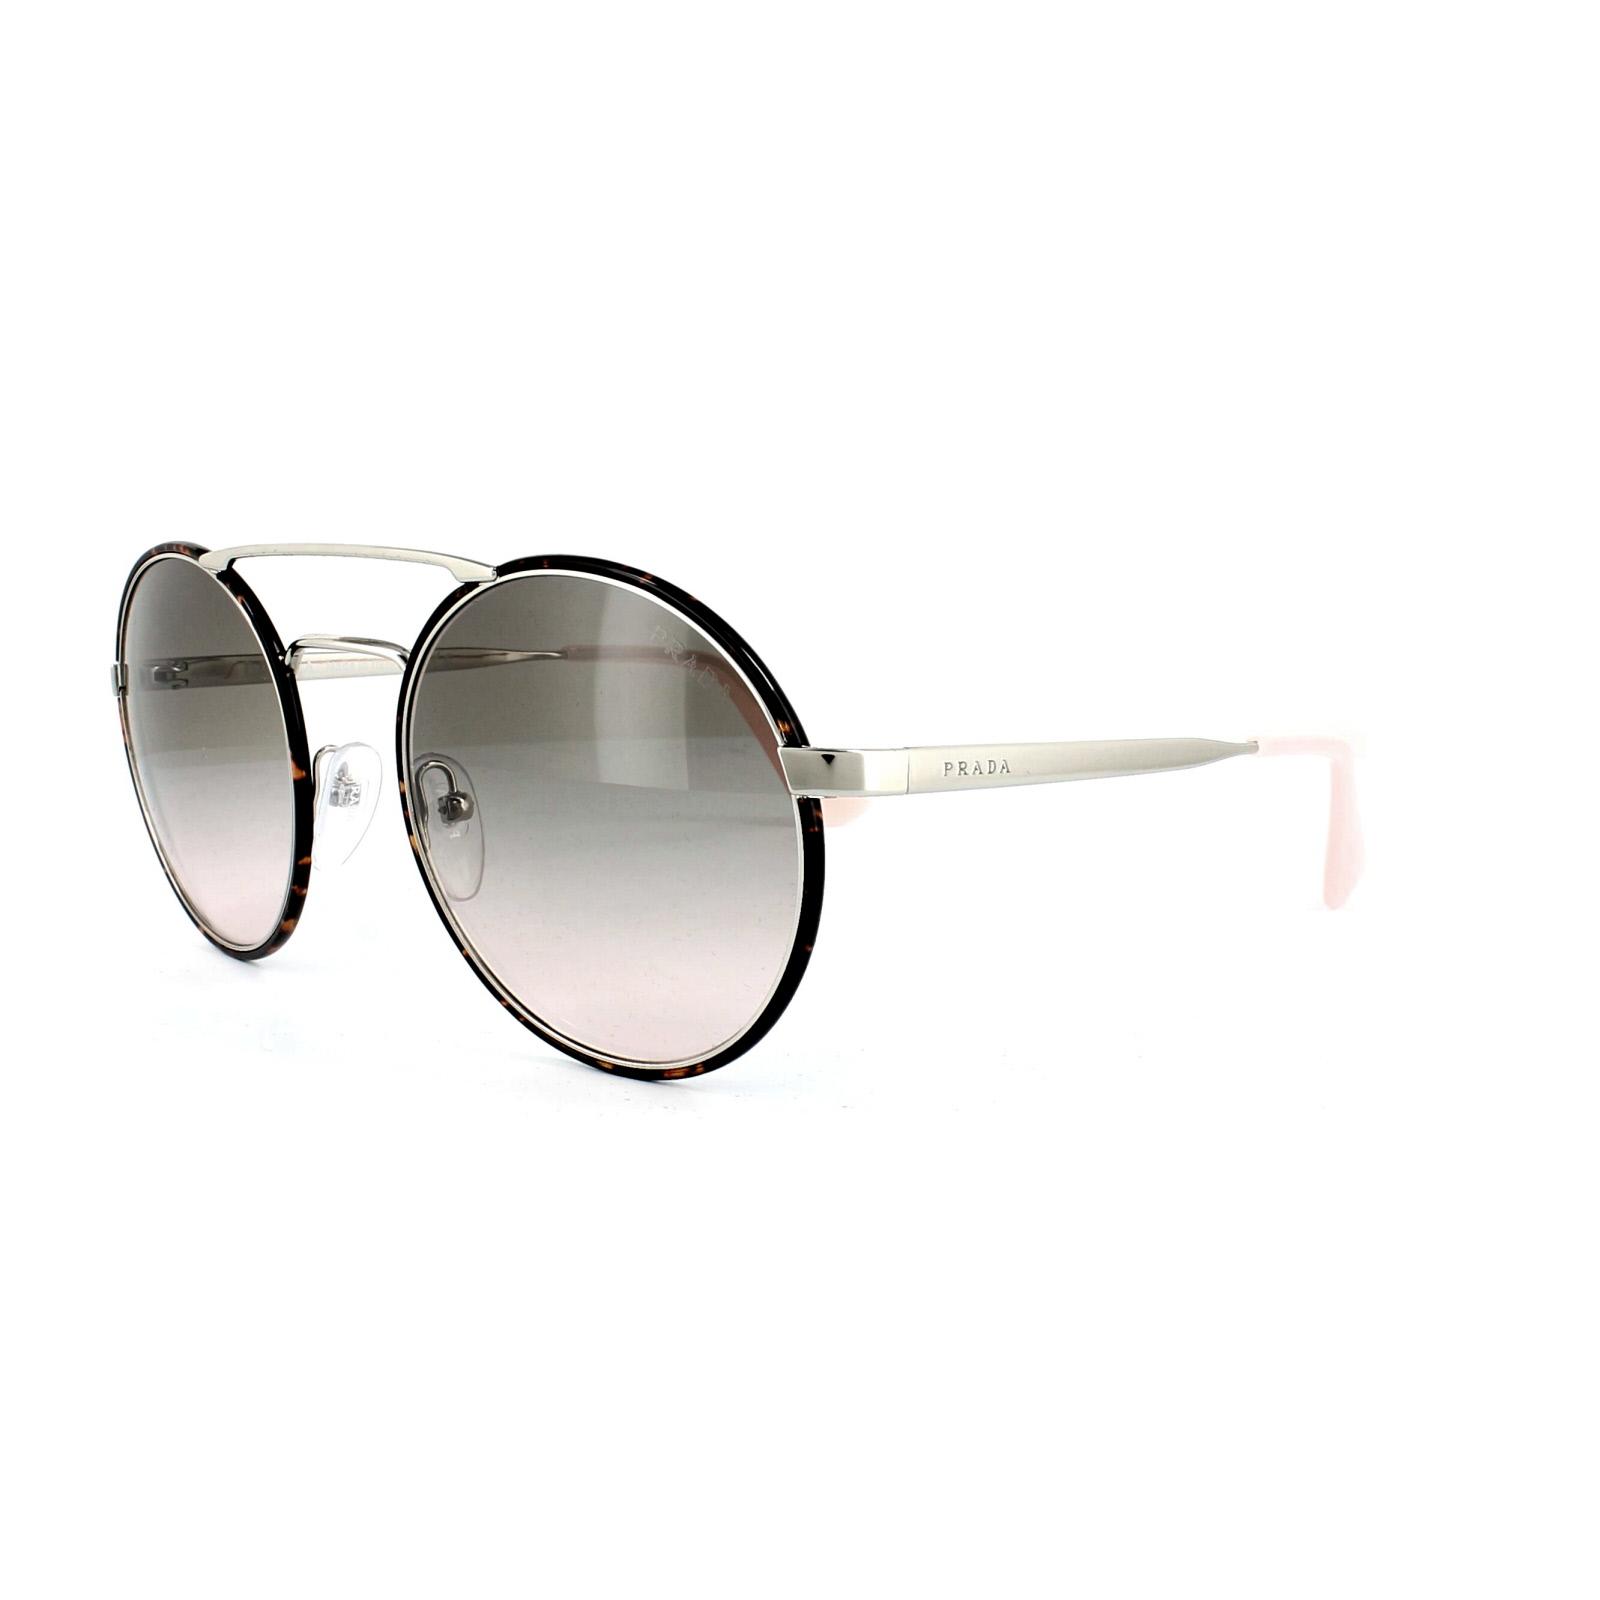 b086fc6a6187 Sentinel Prada Sunglasses 51ss 2AU4K0 Dark Havana Silver Pink Light Pink  Grey Gradient